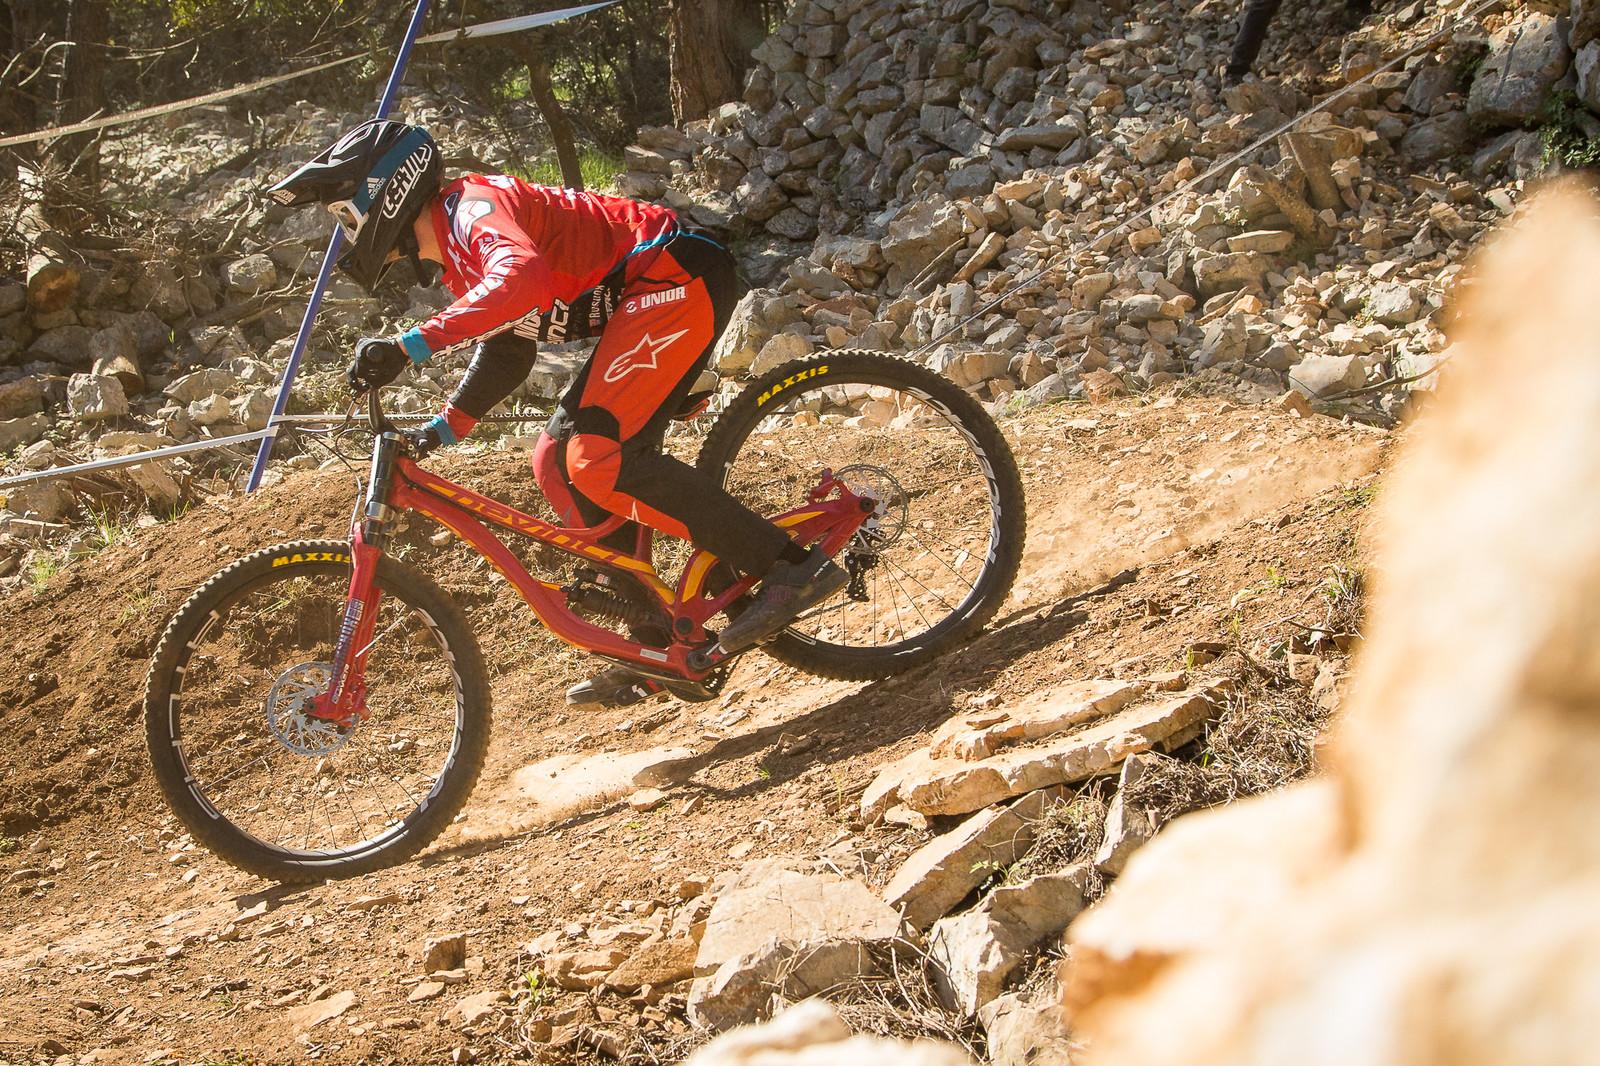 Dakotah Norton Devinci Wilson 29 Bottom Out - G-Out Project 2 - Croatia World Cup DH - Mountain Biking Pictures - Vital MTB